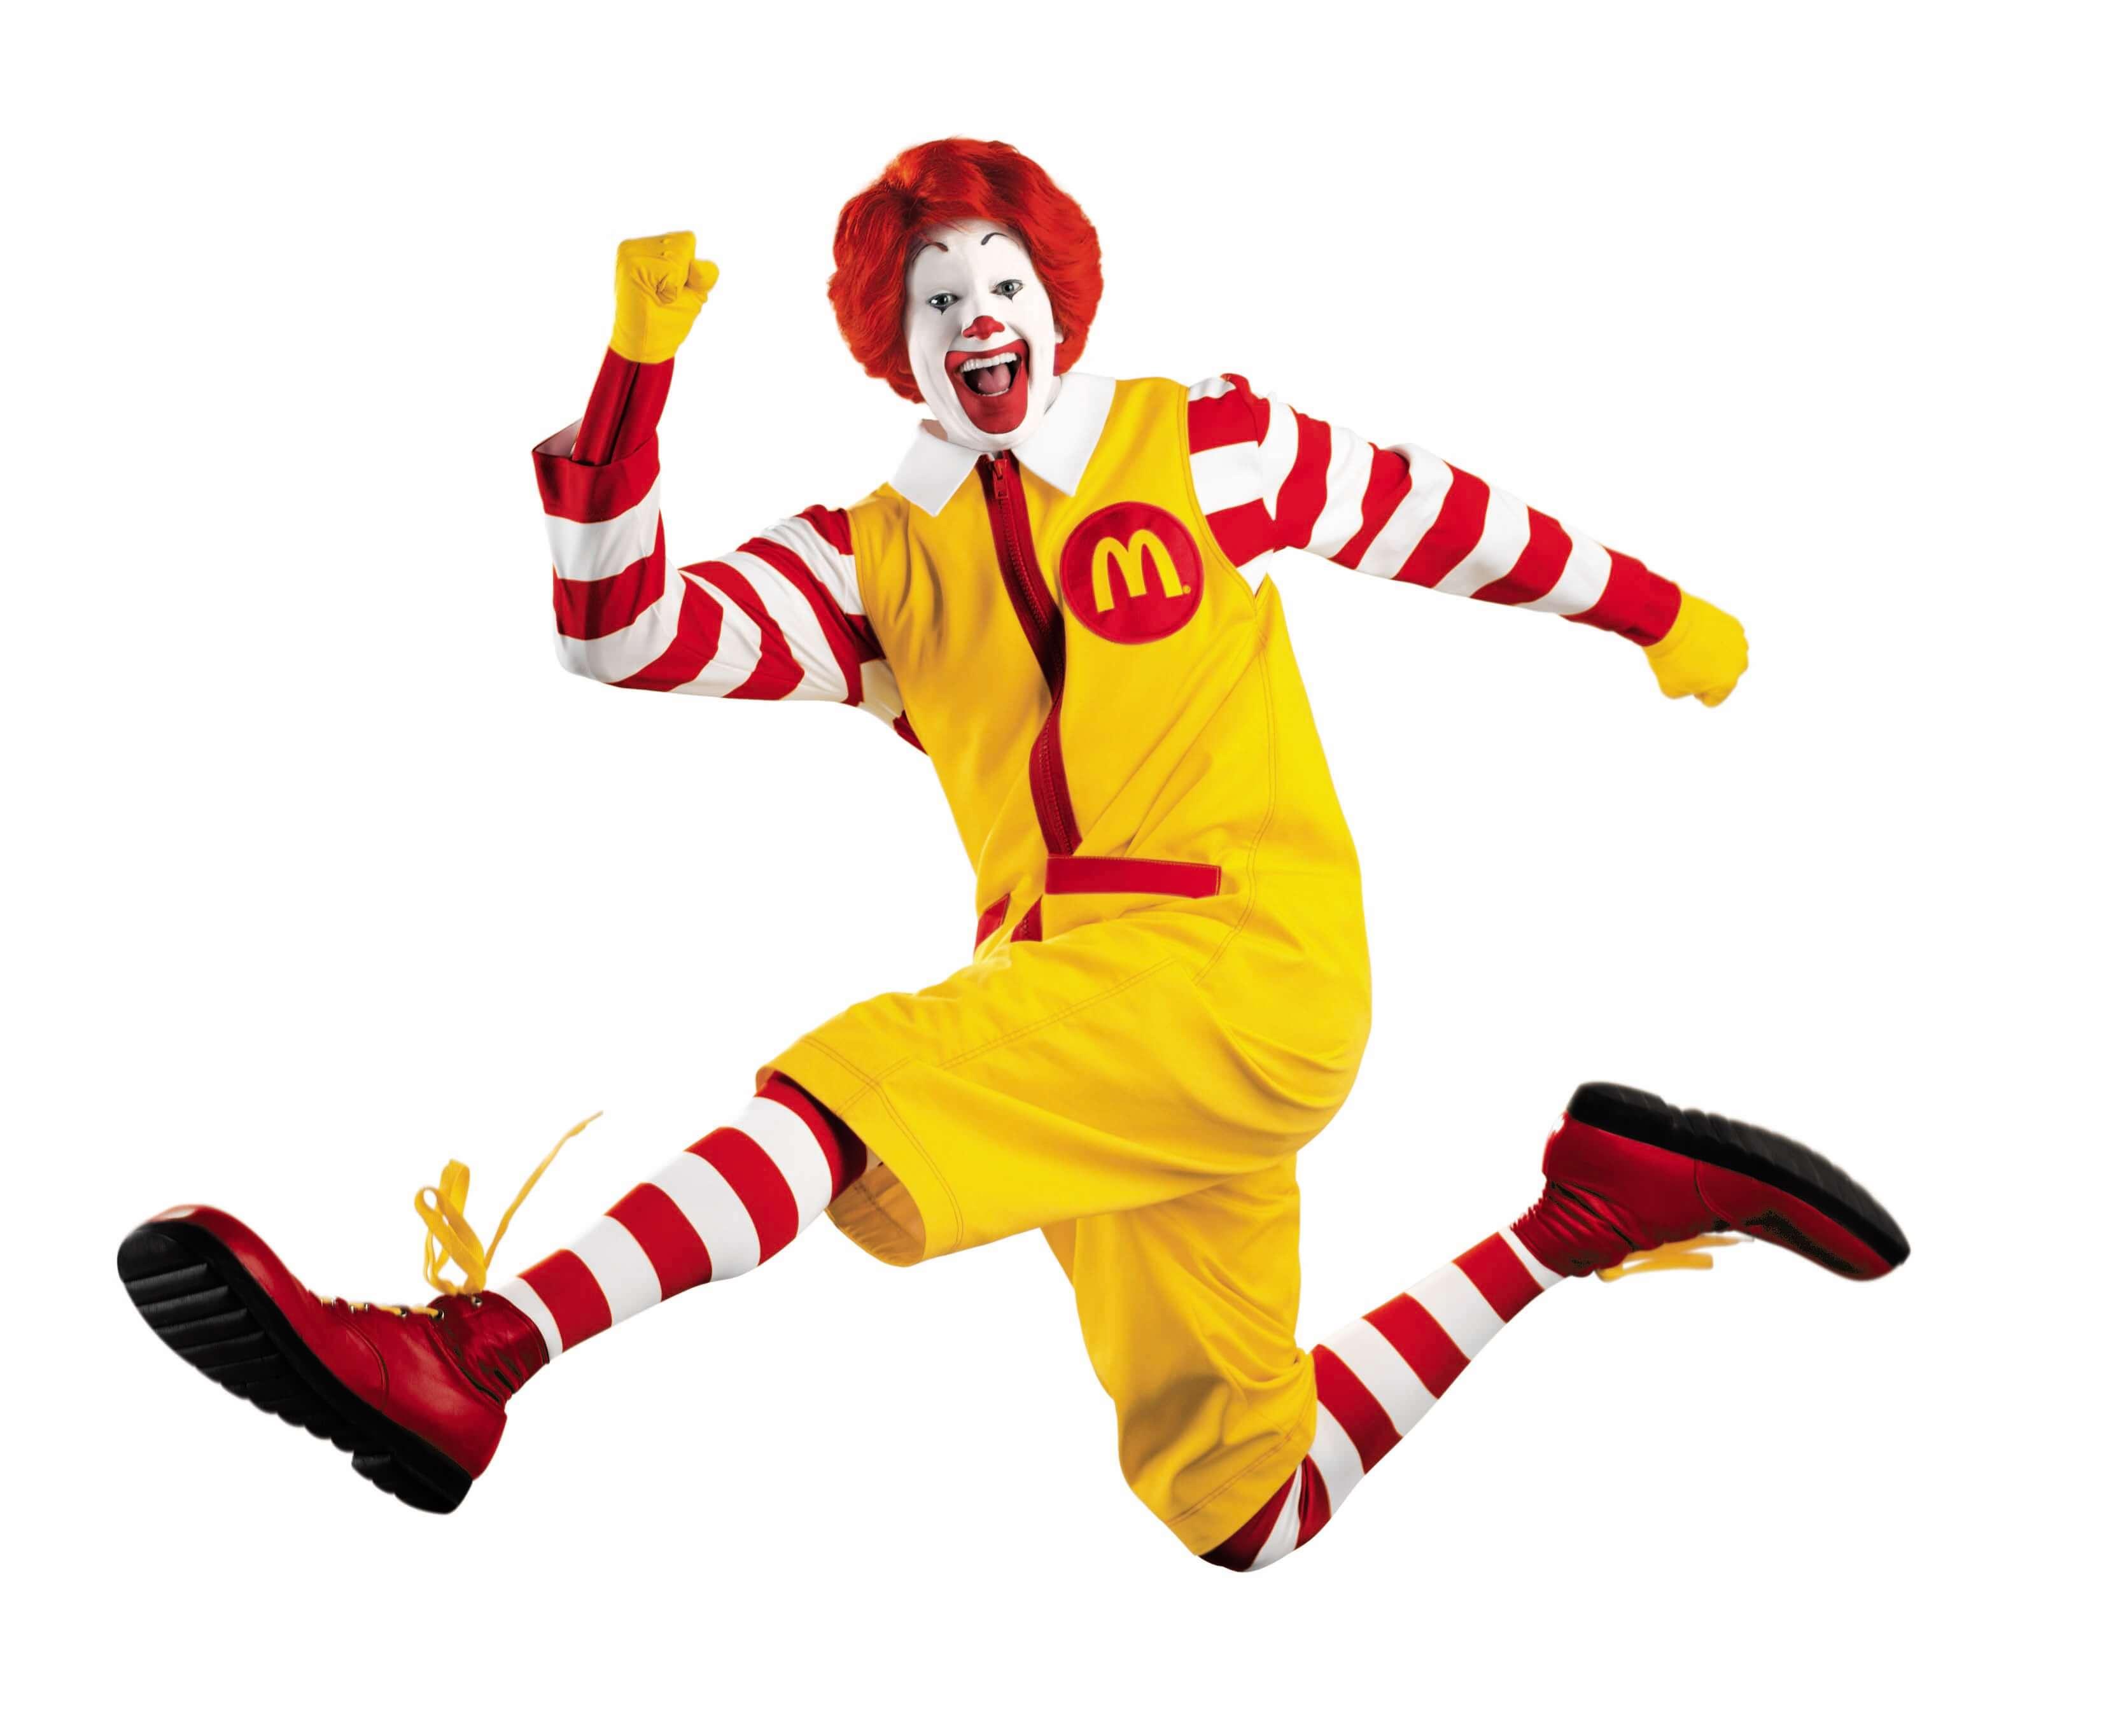 Роналд Макдоналд уходит из Макдоналдса